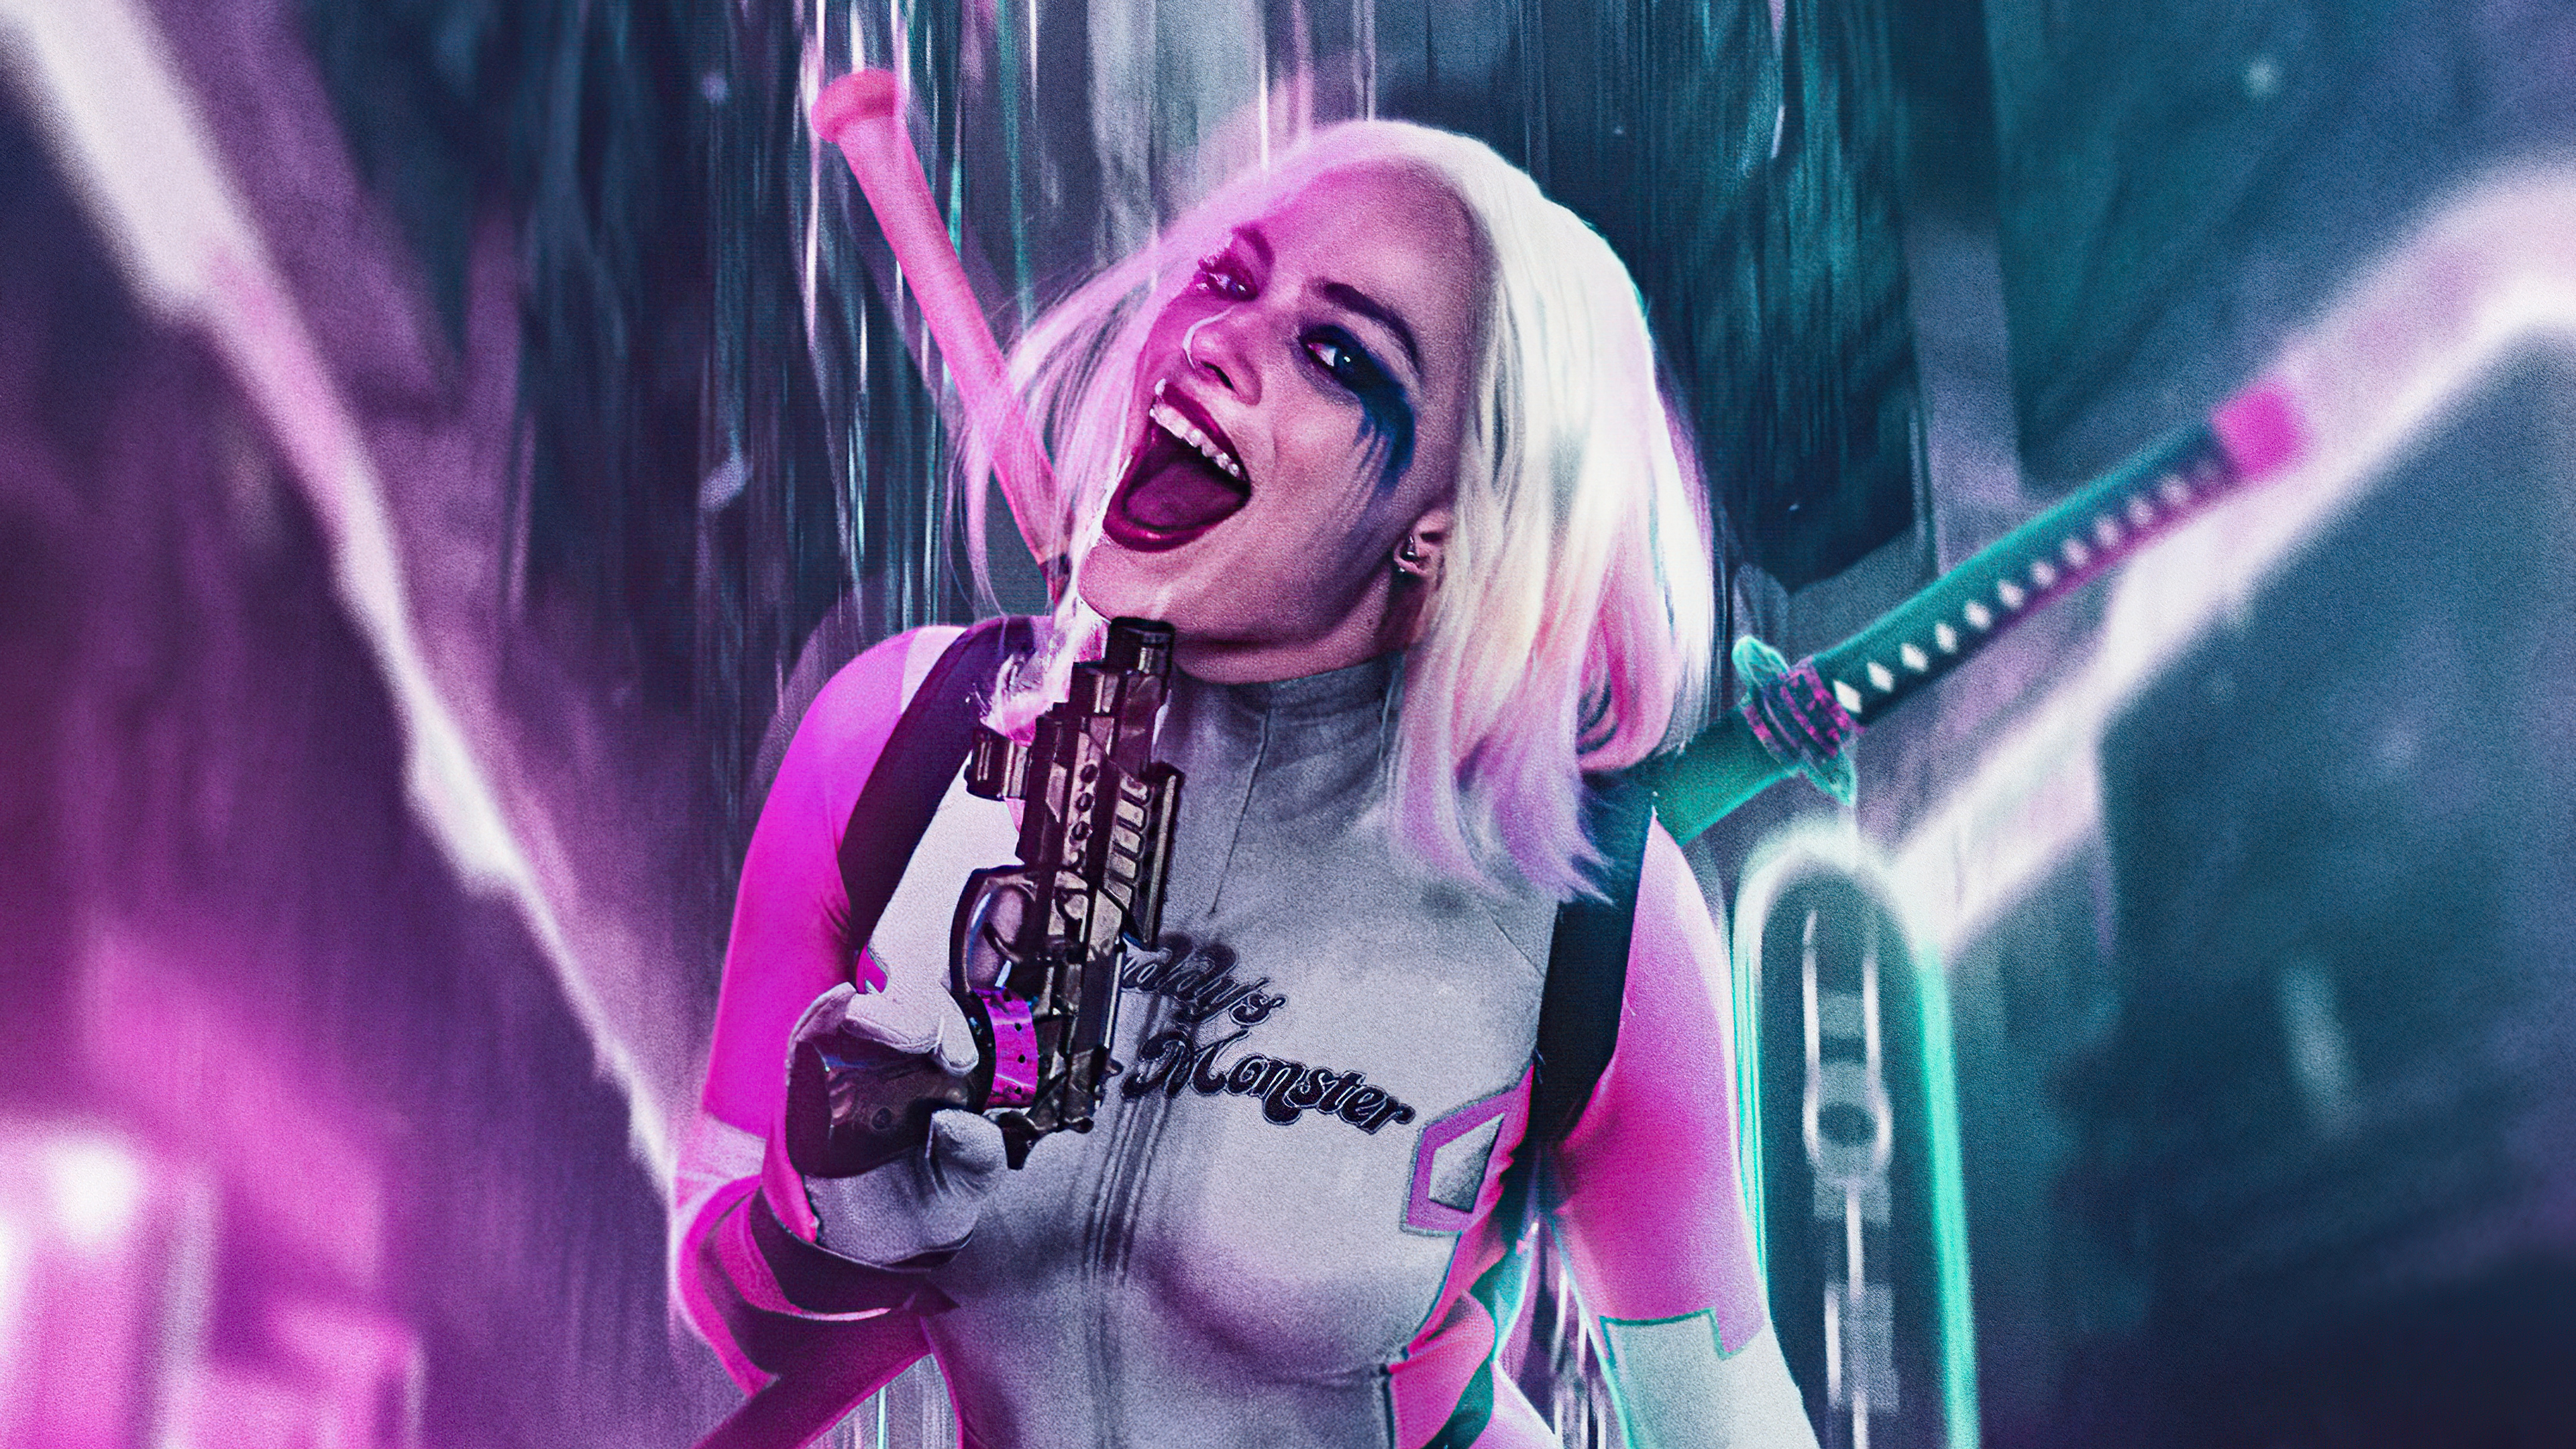 Fondos de pantalla Gwenpool X Harley Quinn